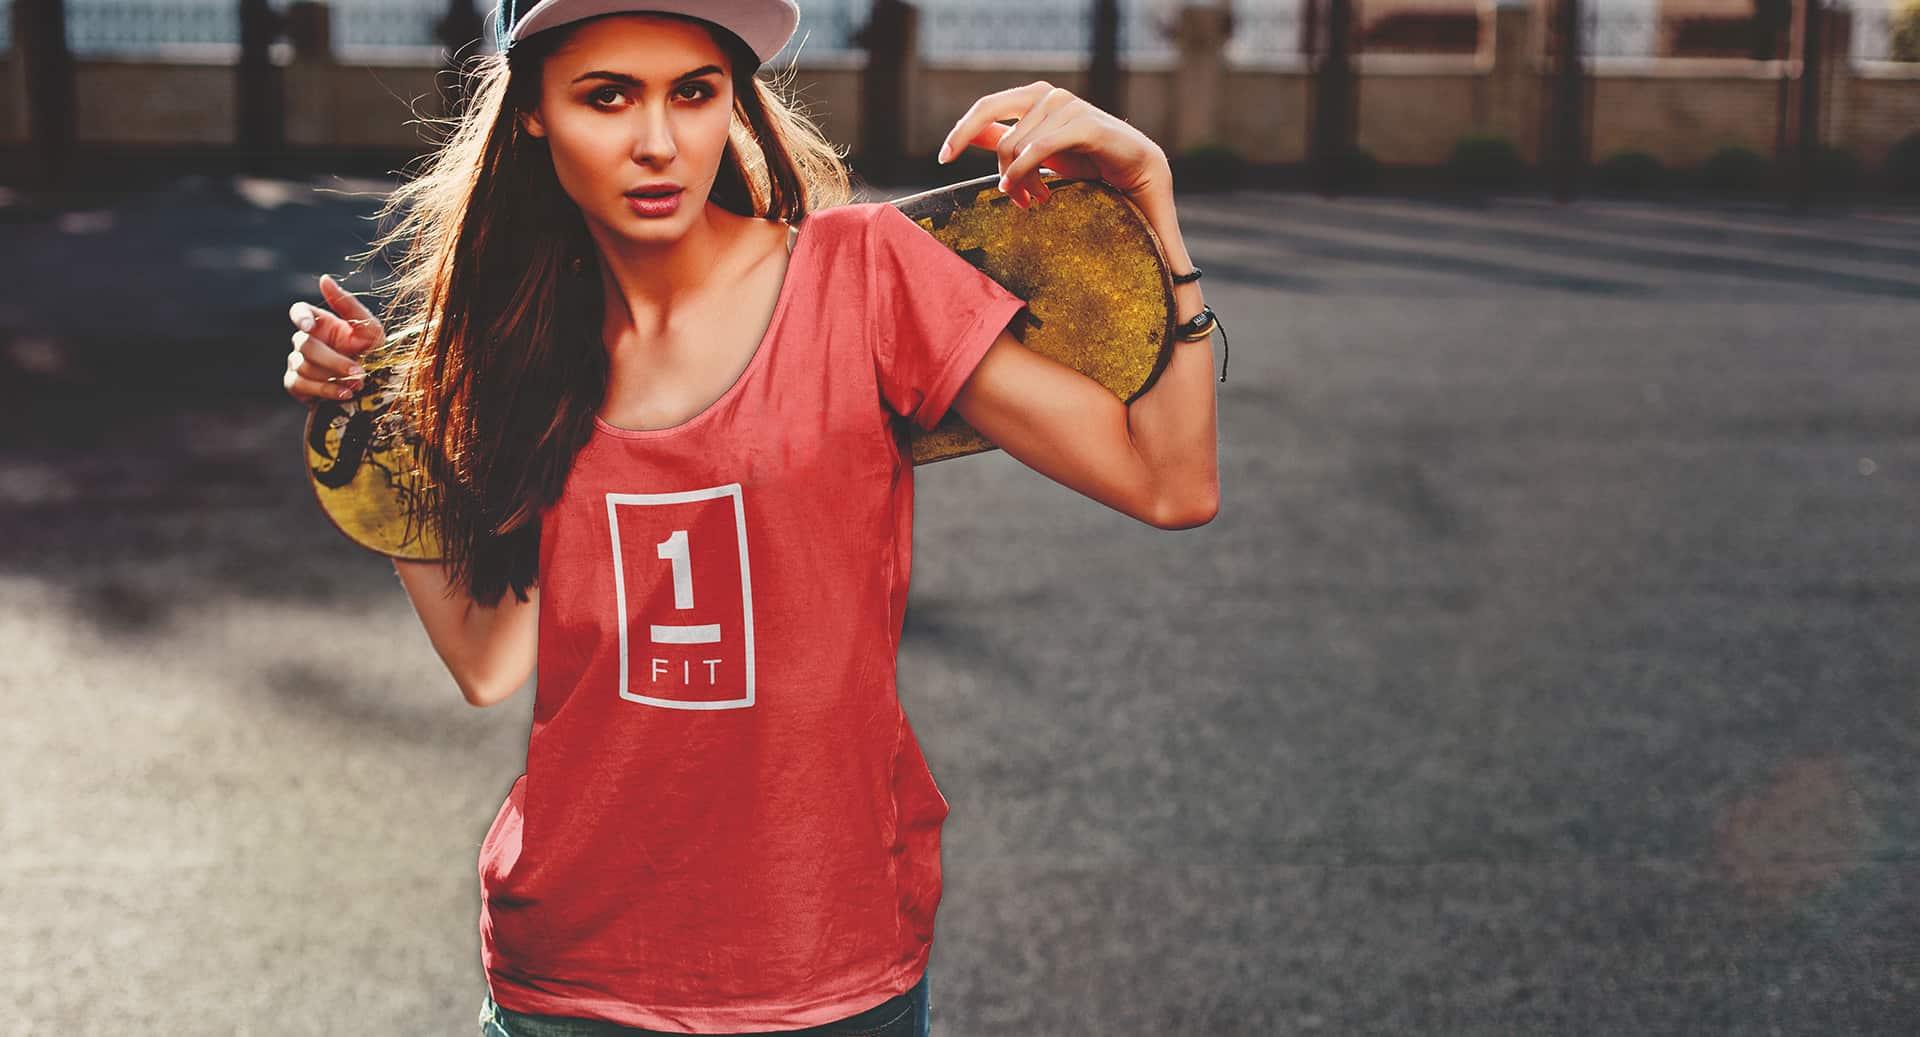 onefit-tshirt-halfwidth